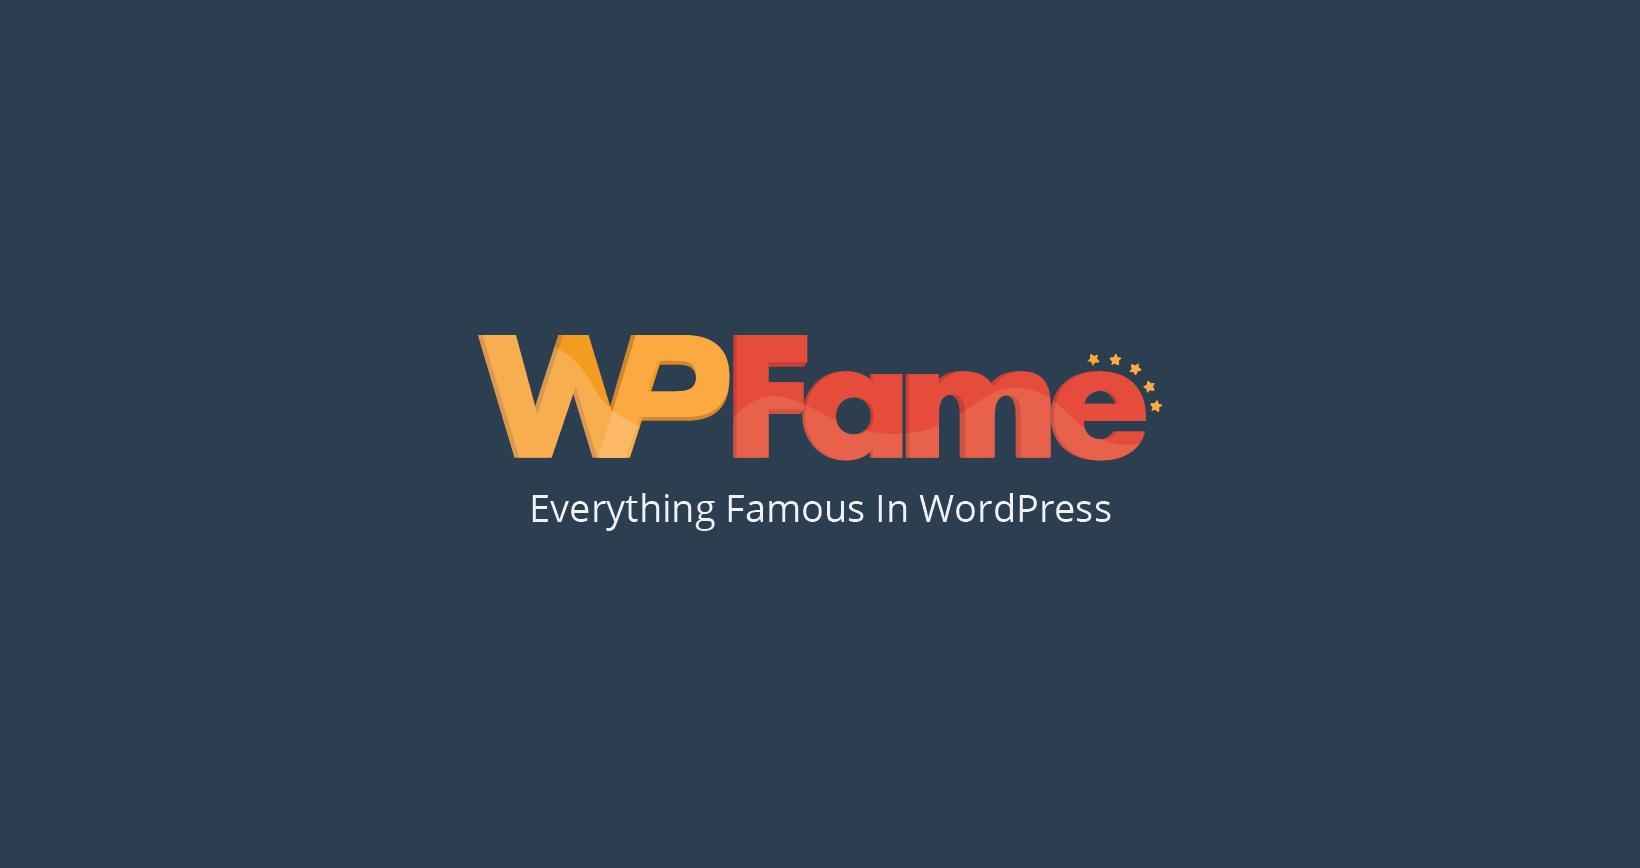 Buy Wordpress Templates - Wordpress & PSD Template Store